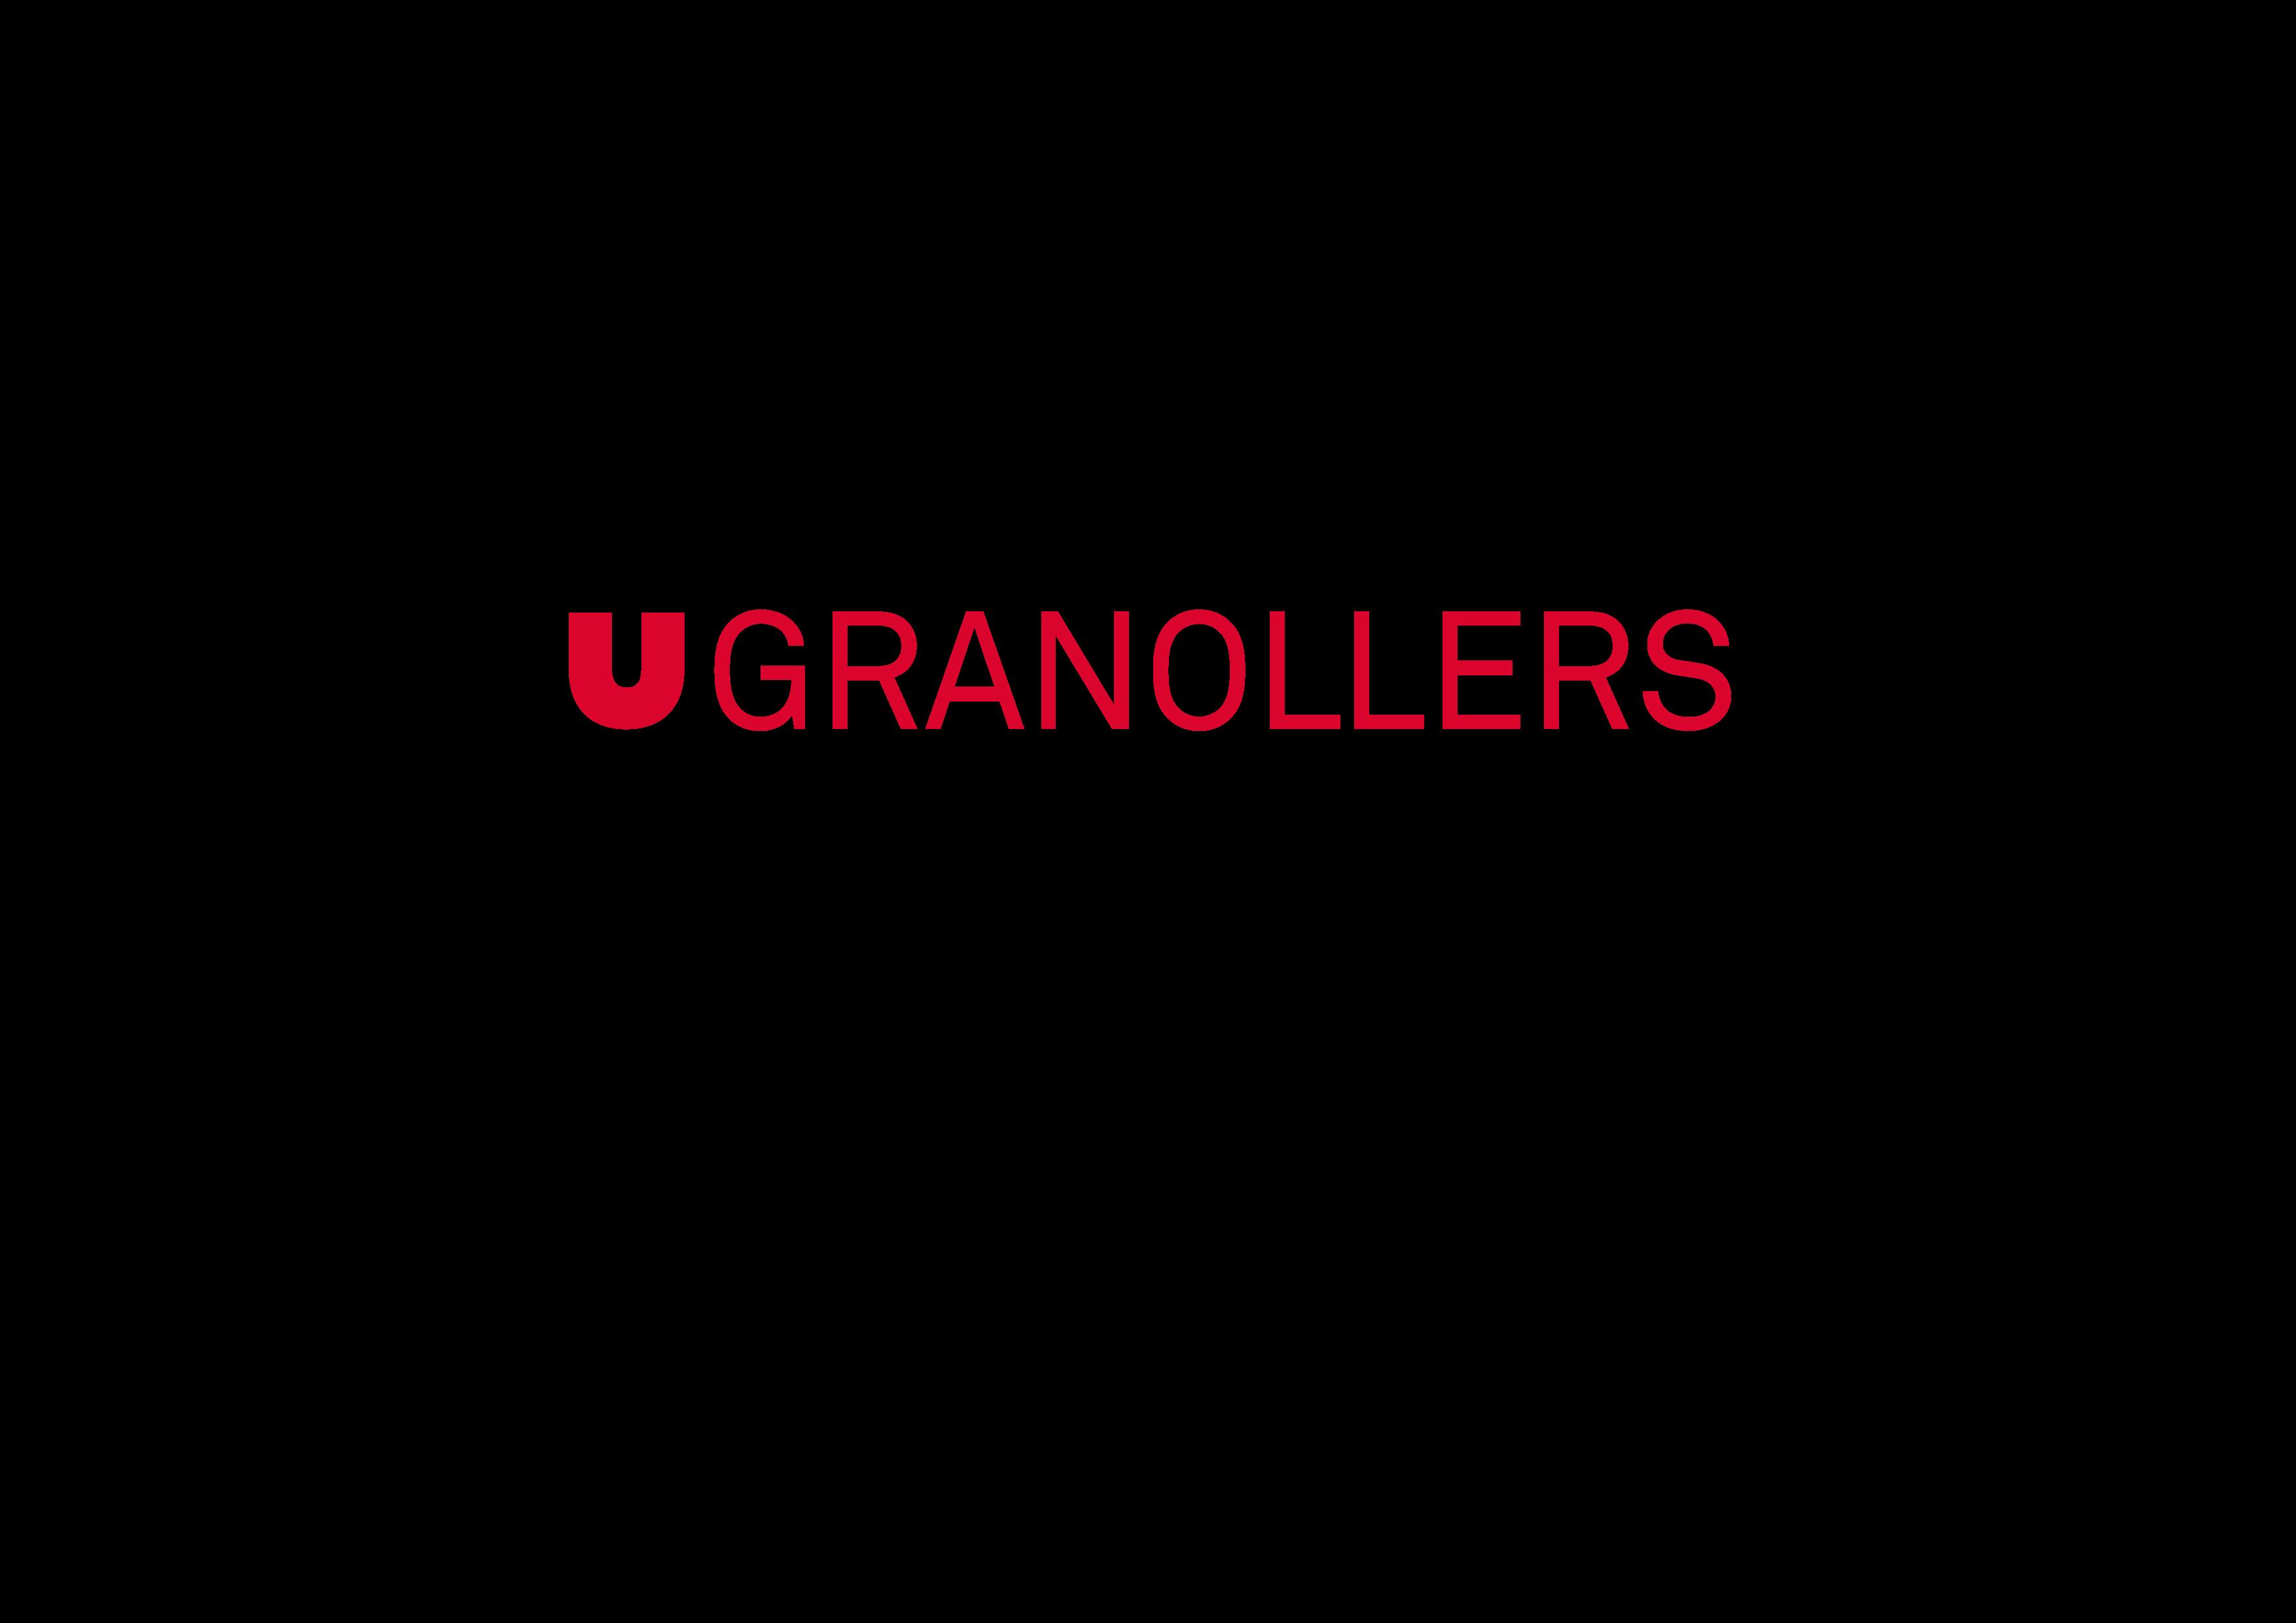 UGranollers